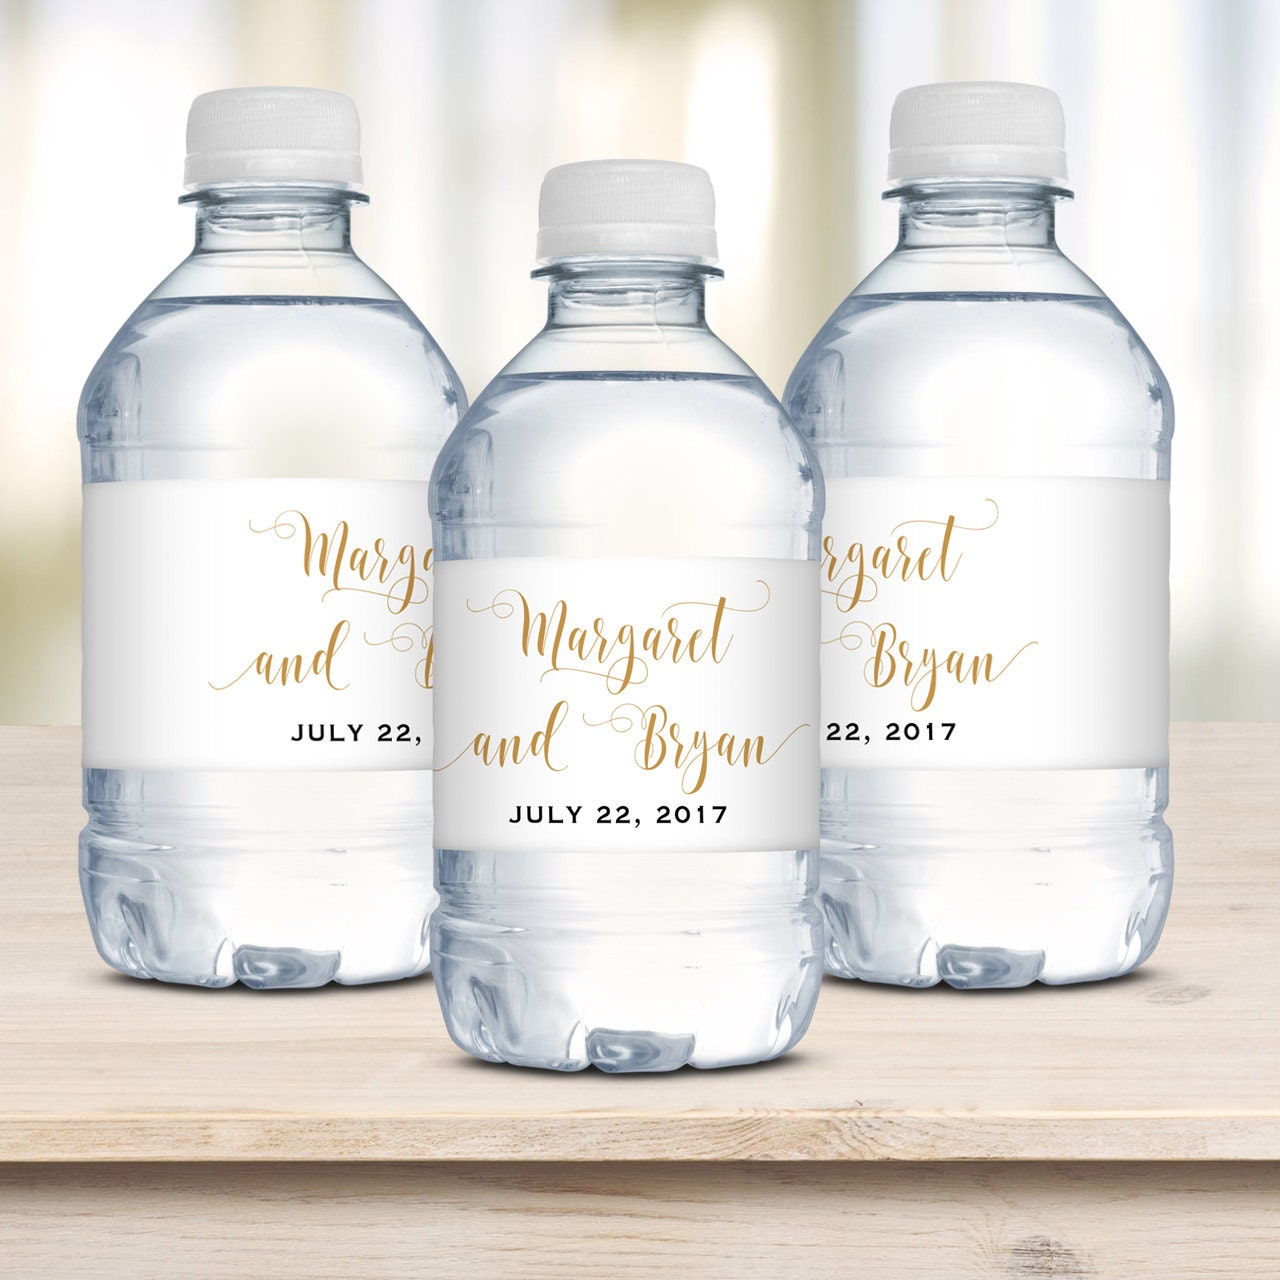 Personalized Sports Bottle Labels: Wedding Water Bottle Labels Waterproof Label Personalized